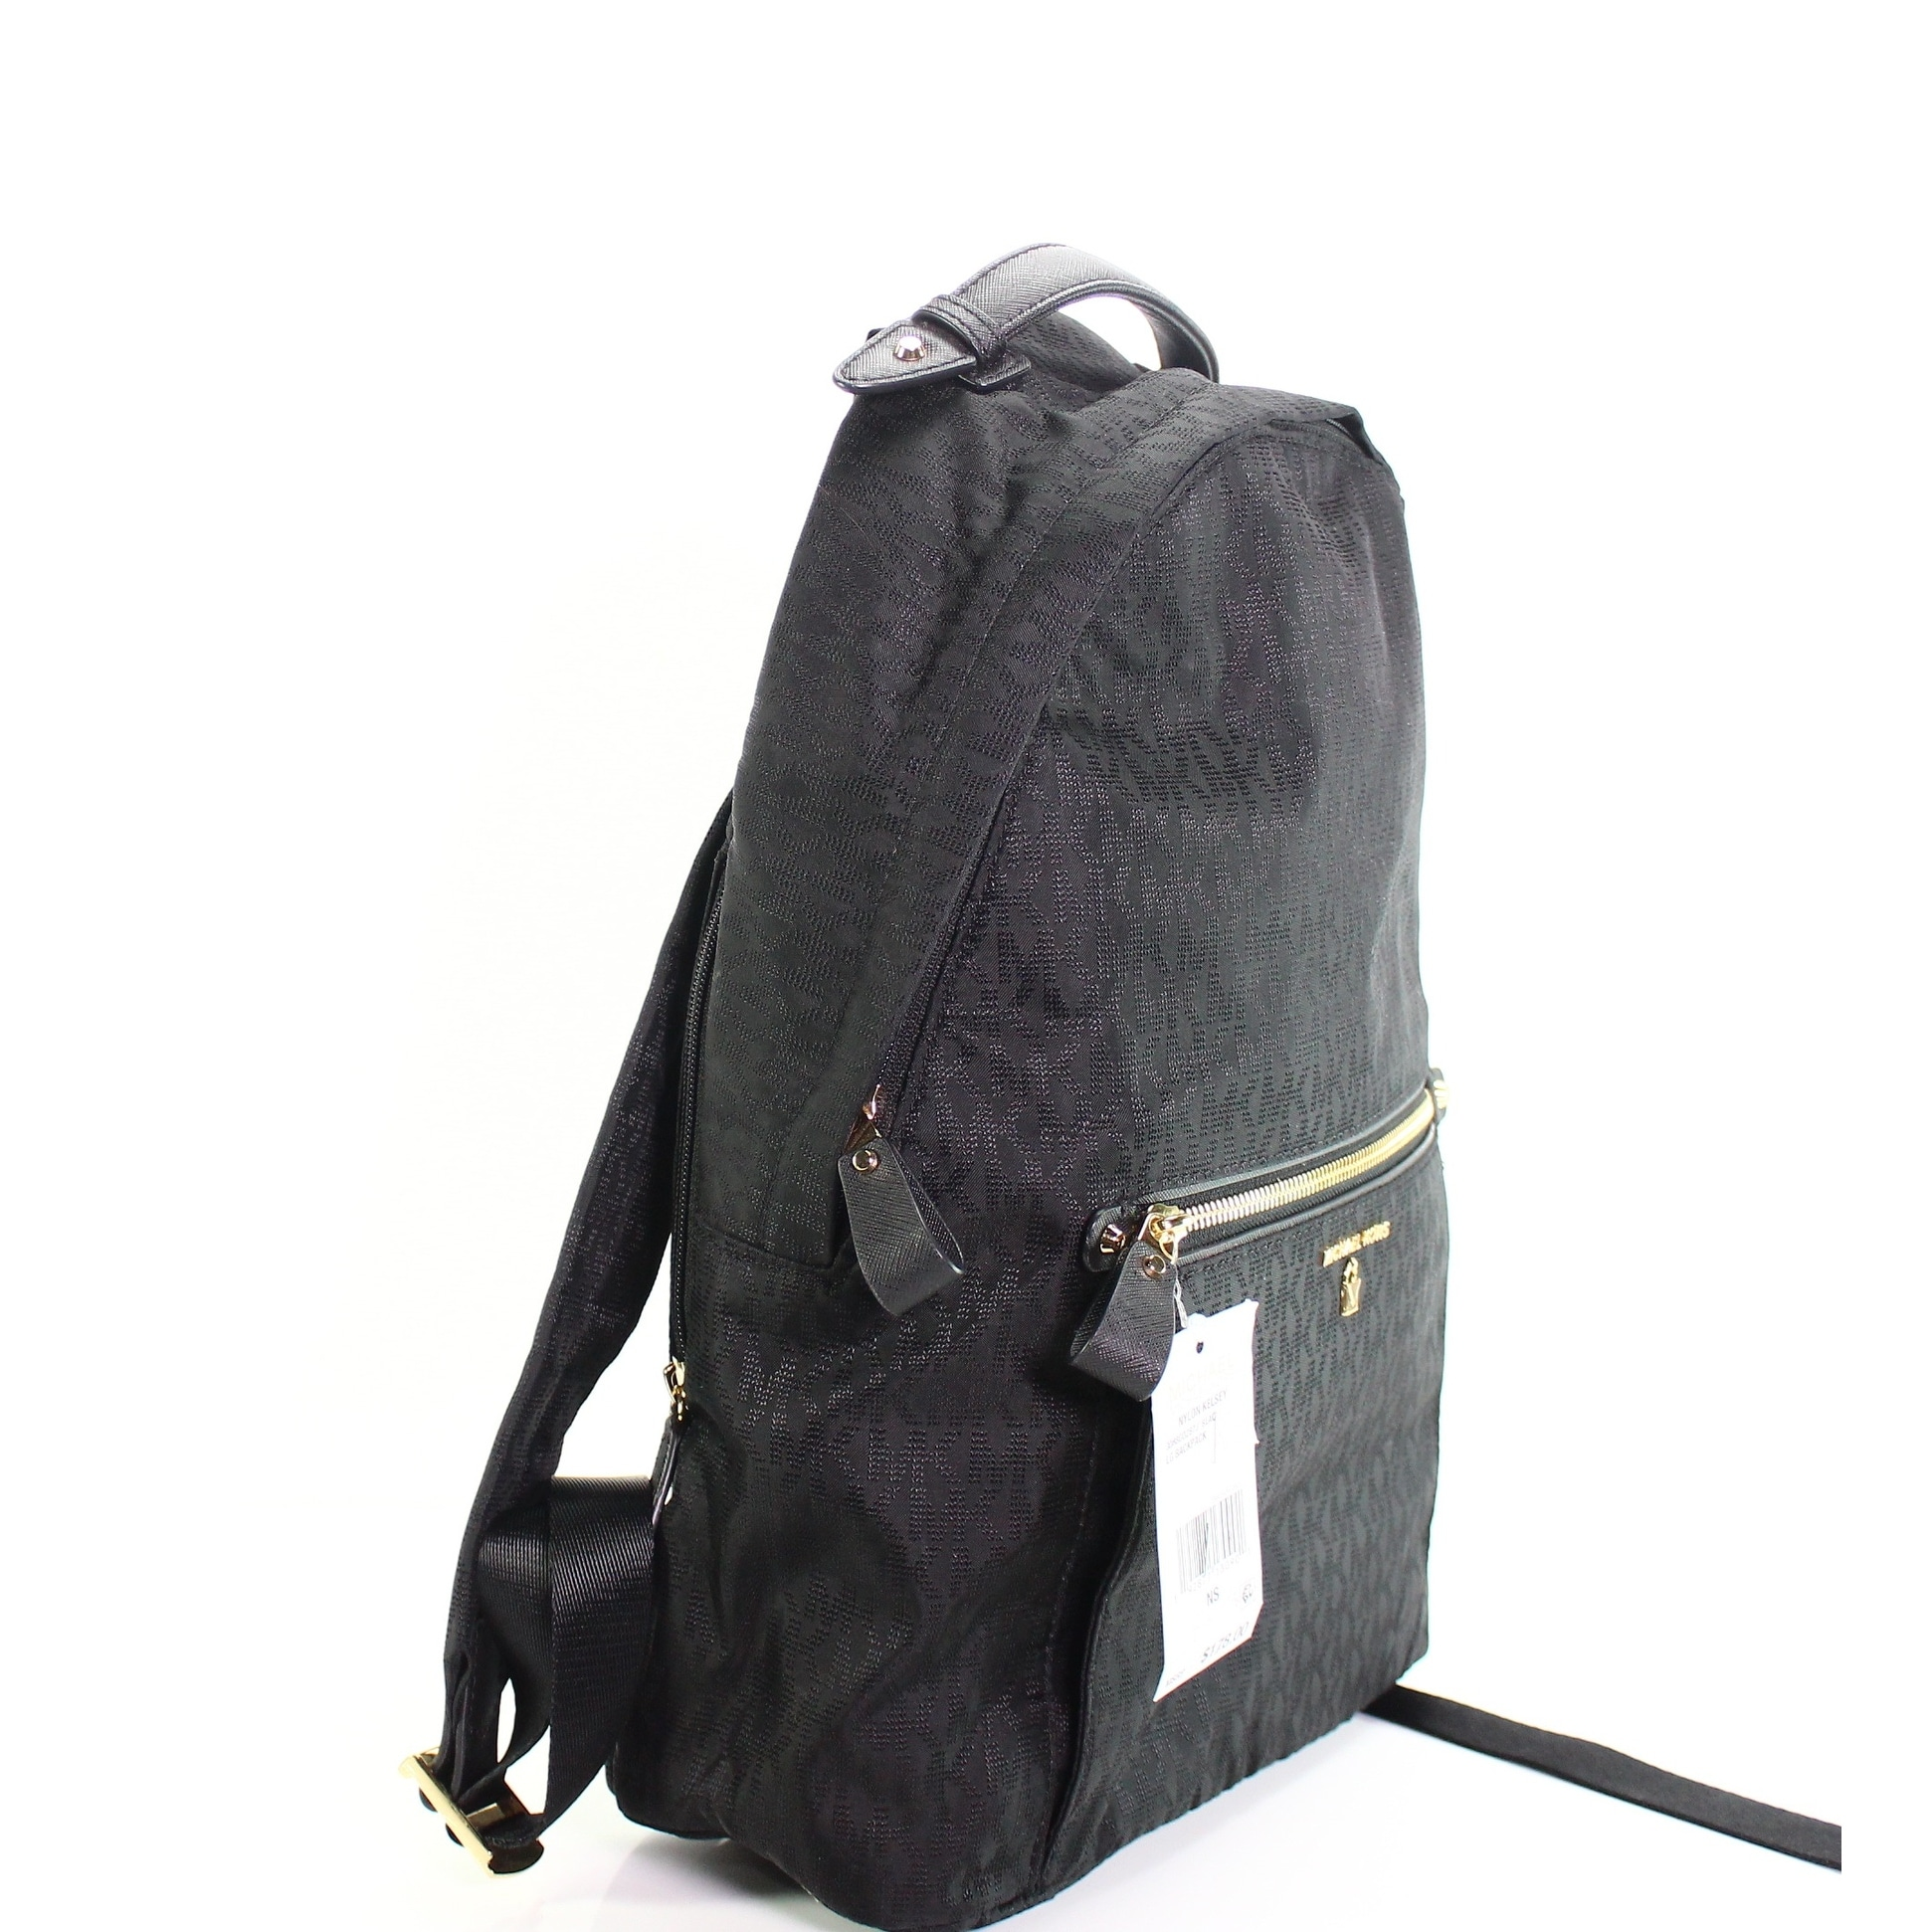 5d1064a3184af0 Shop Michael Kors Black Nylon Kelsey Signature Backpack Handbag Purse -  Free Shipping Today - Overstock - 27342077